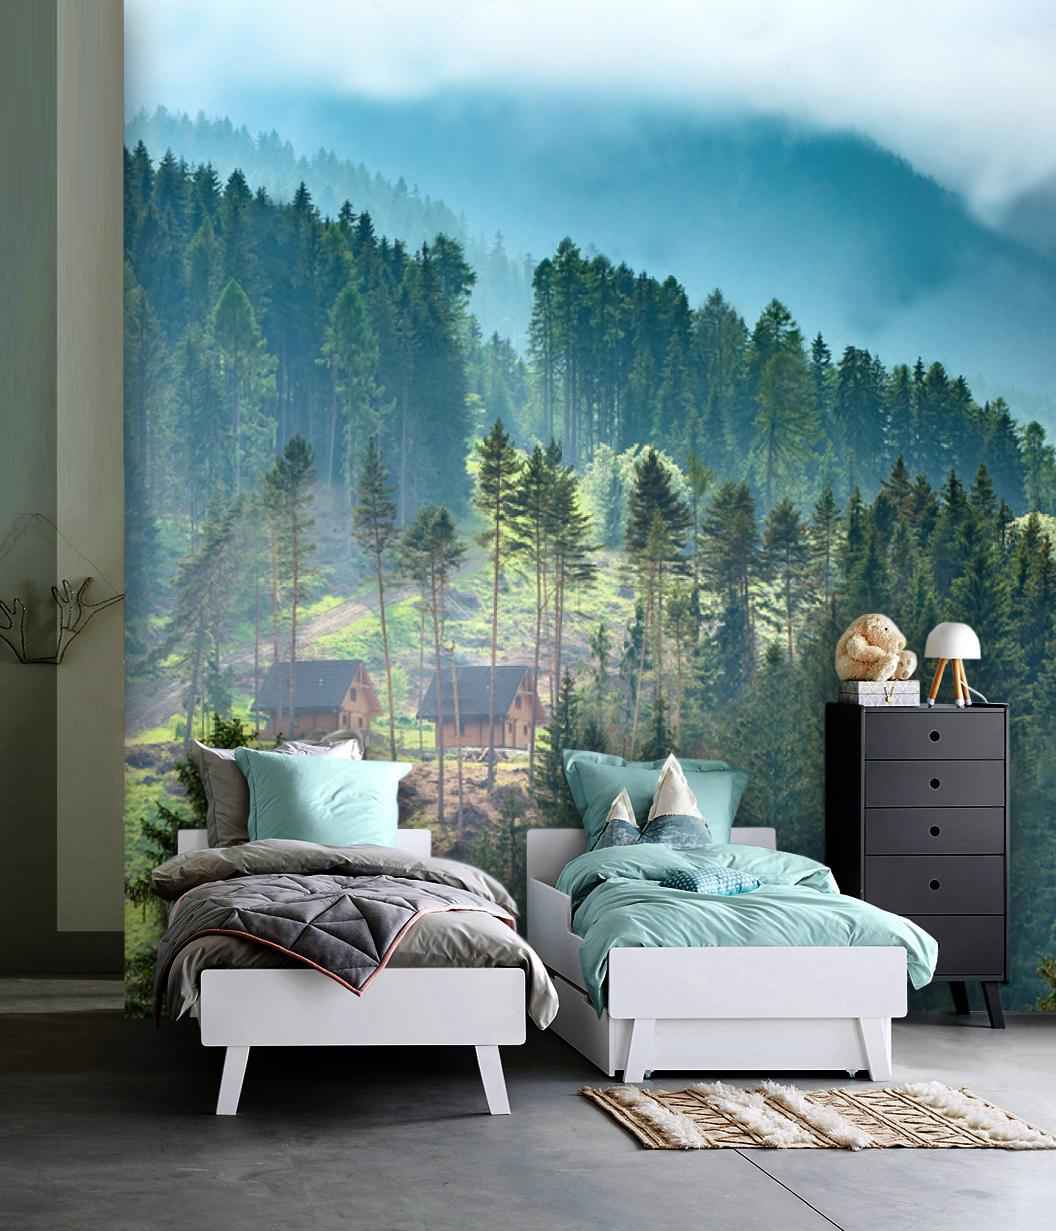 Wallpaper Forest Mountain Pine Pattern Selfadhesive Vinyl Design